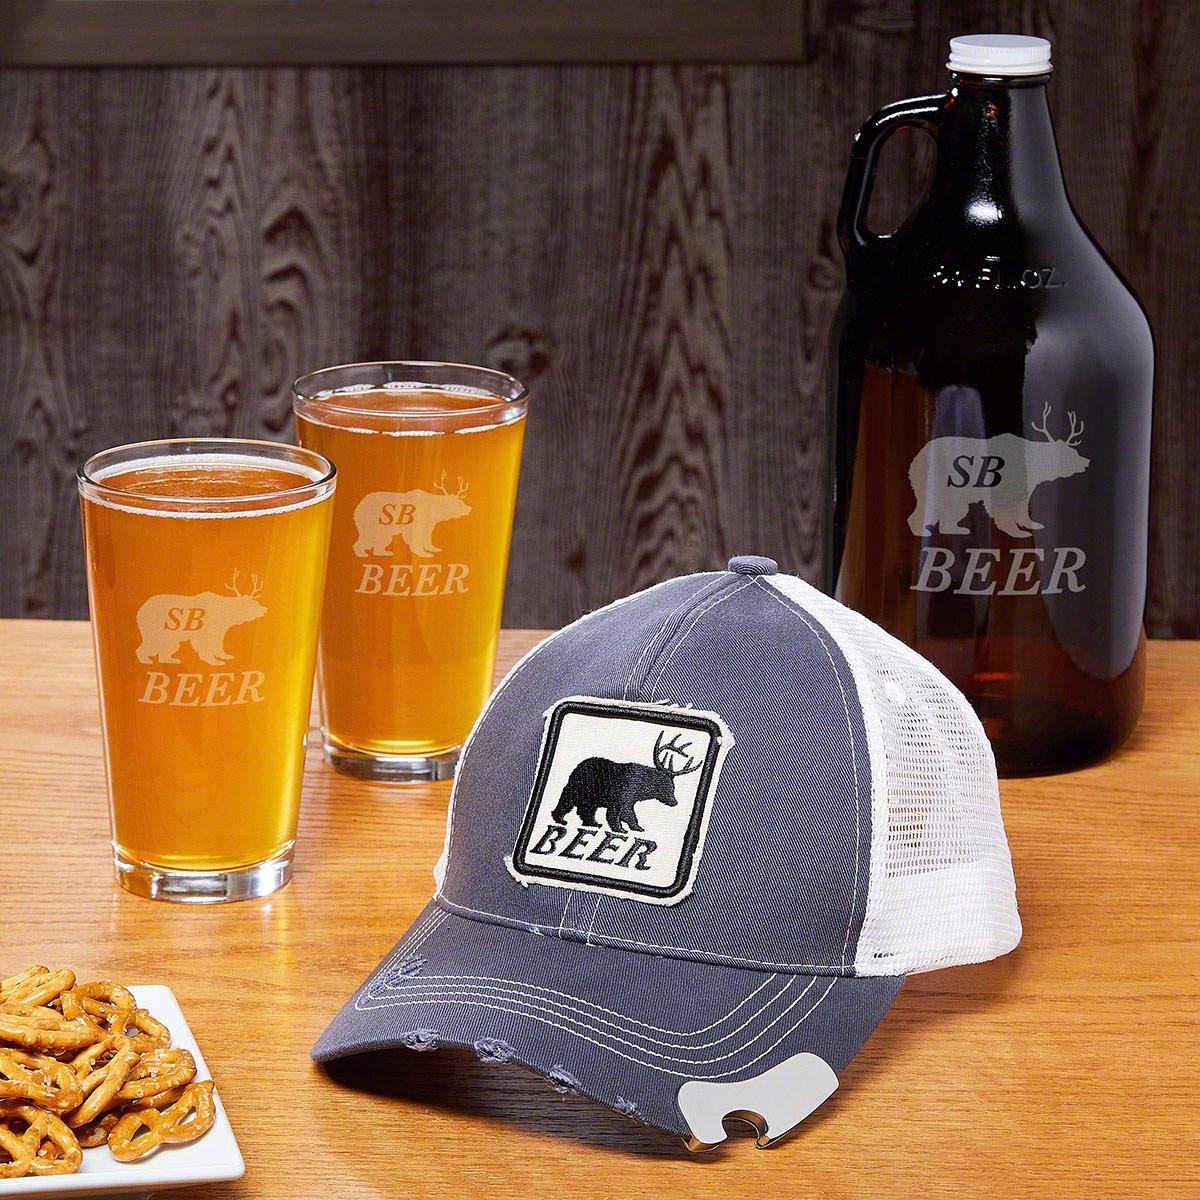 Bear Beer Deer Baseball Cap Bottle Opener Amp Personalized